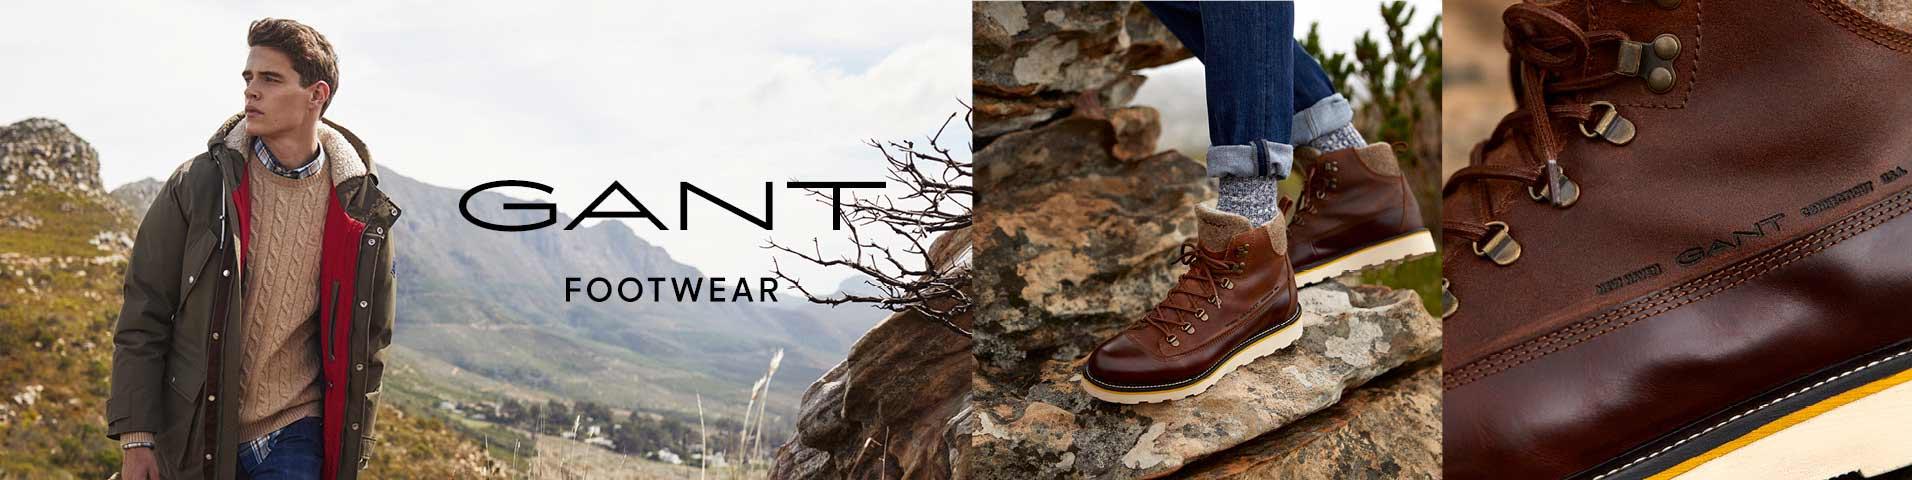 GANT Sko | Herresko | Kjøp nye herresko på nett hos Zalando